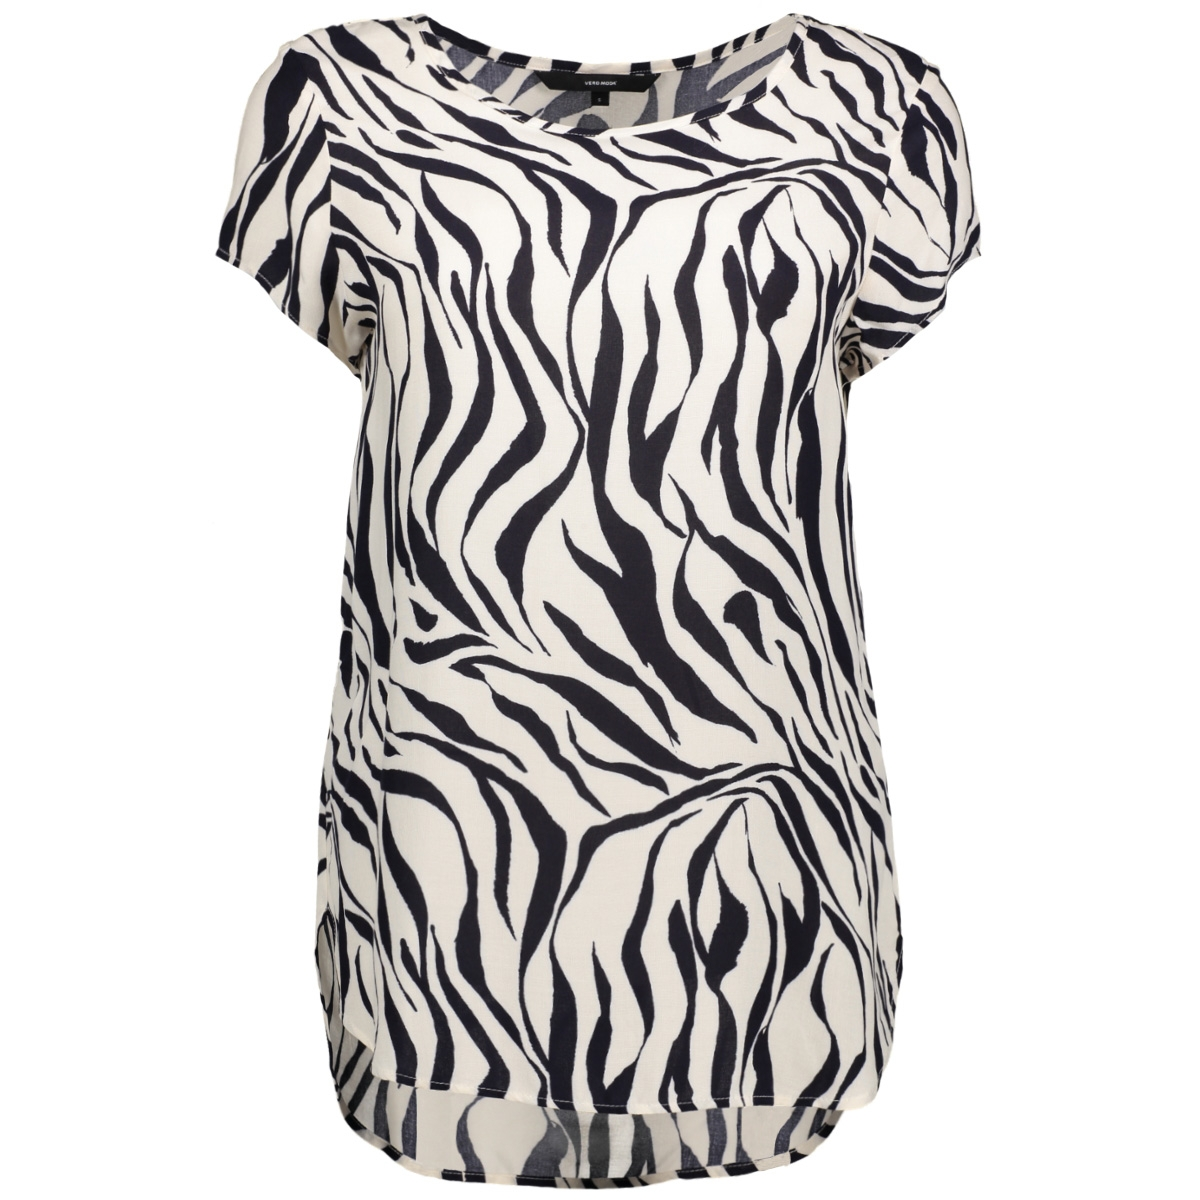 vmboca ss blouse multi printed 10132802 vero moda t-shirt whitecap gray/zanzana